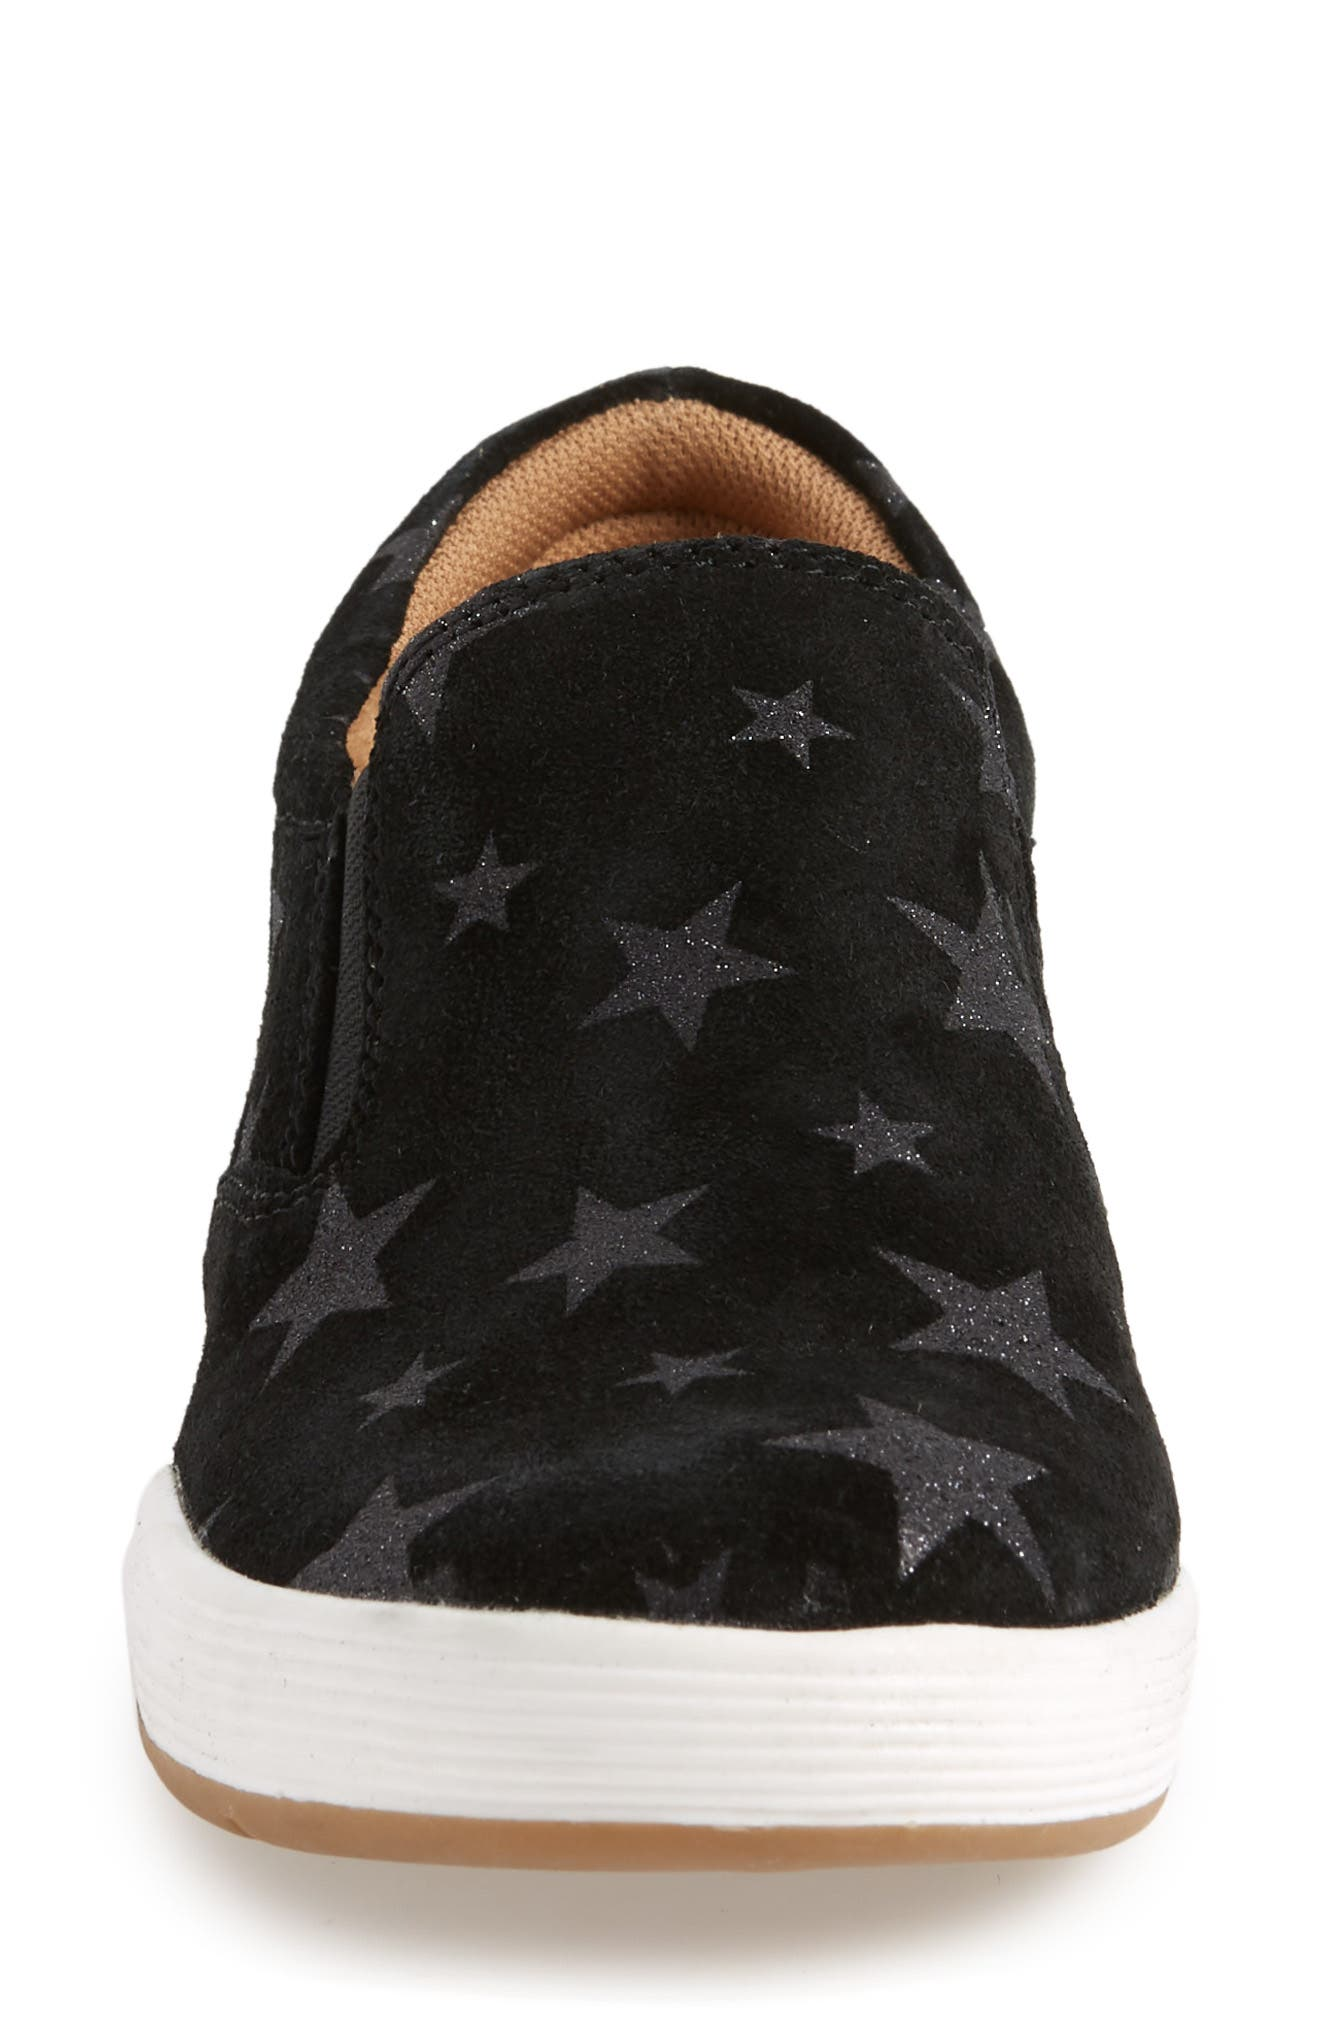 Linette Suede Slip-On Sneaker,                             Alternate thumbnail 4, color,                             BLACK SUEDE